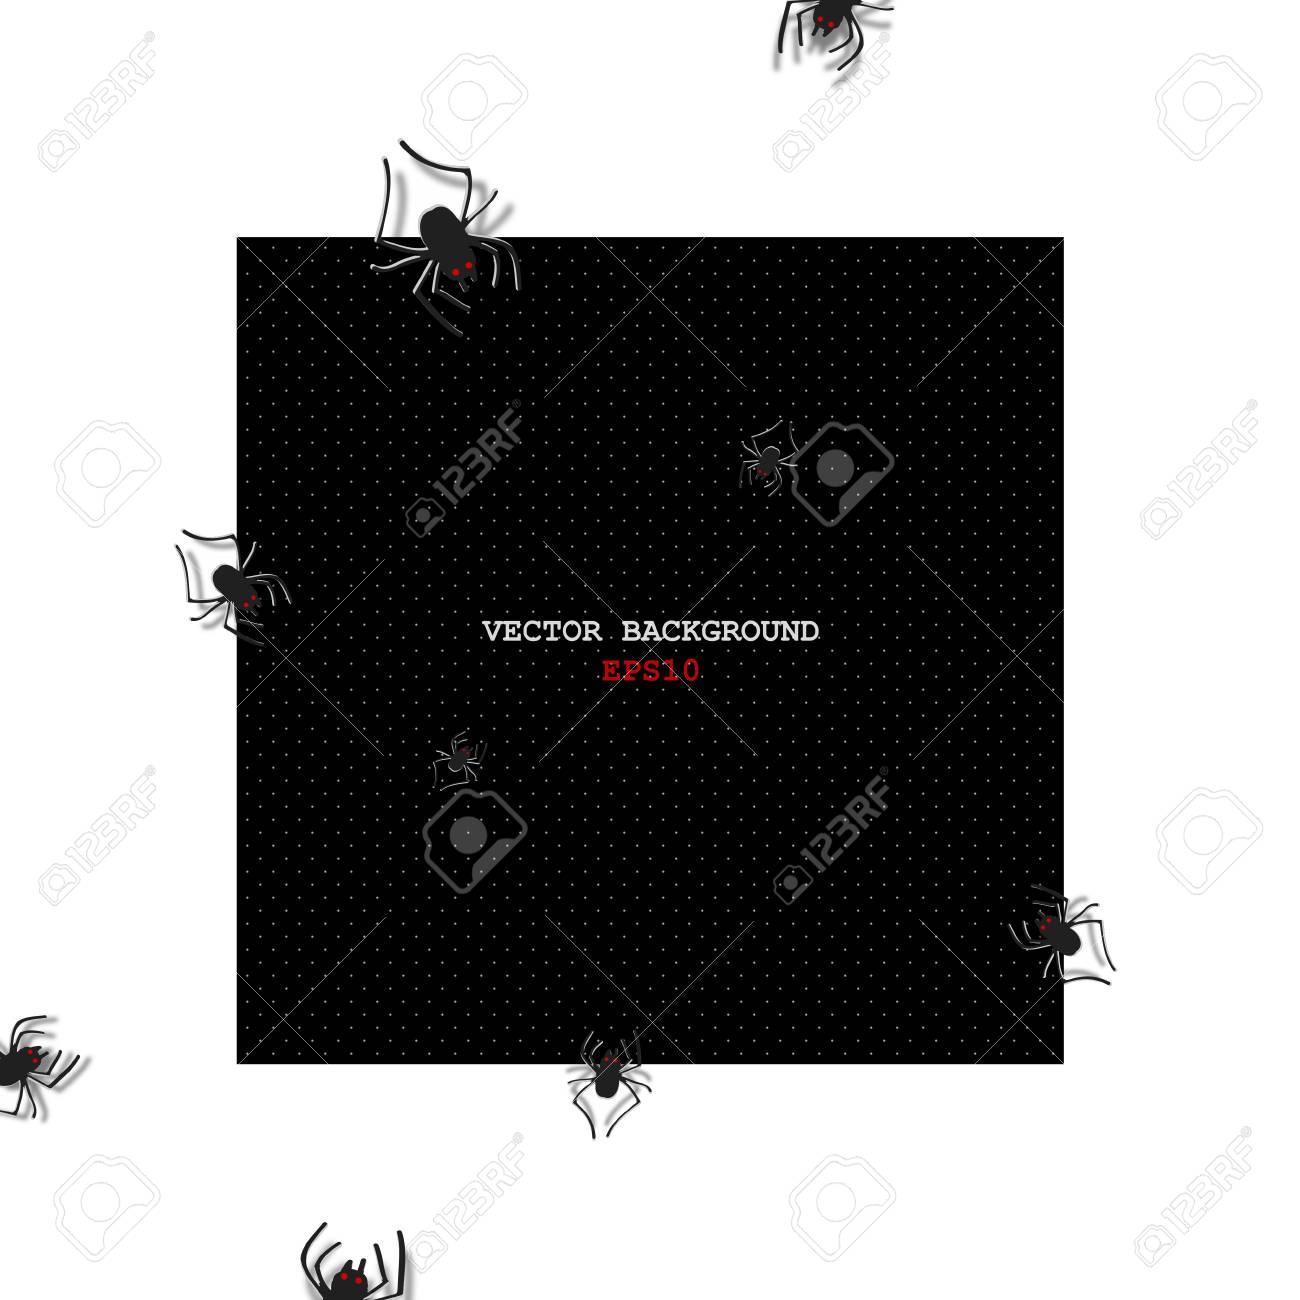 Spider. Vector background. Eps 10 Stock Vector - 20960942